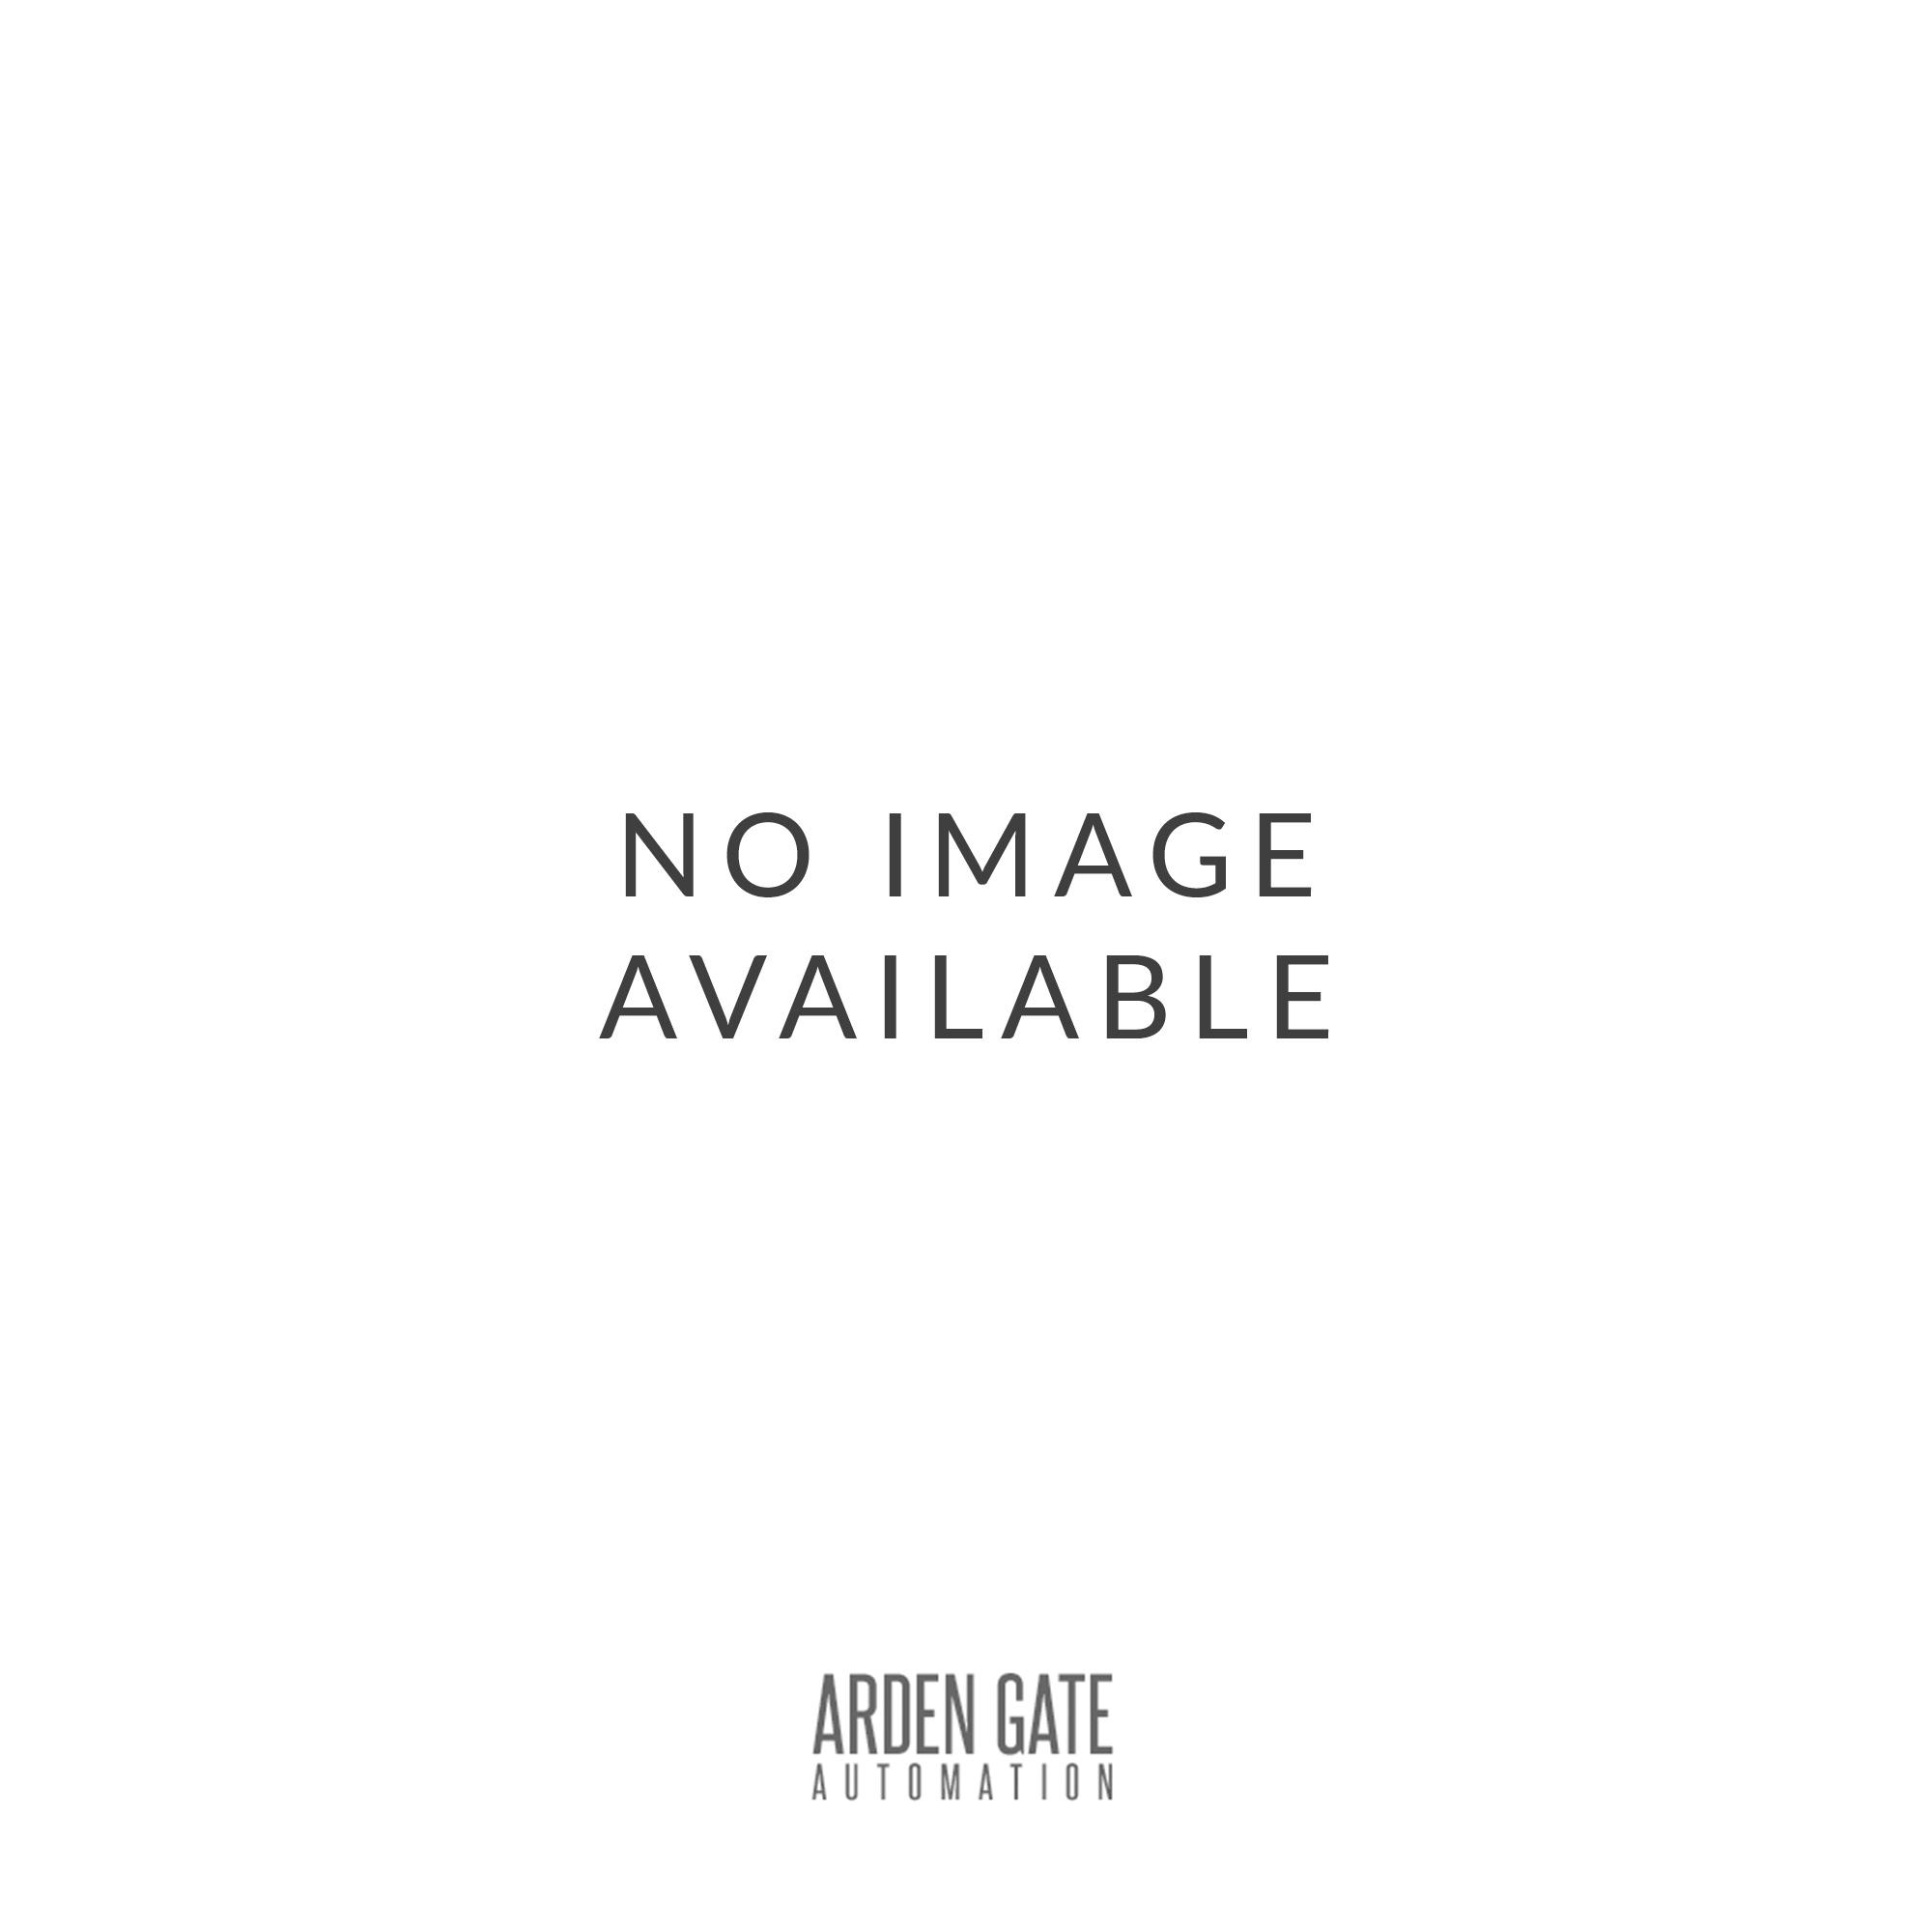 CDVI 1 Channel External Transmitter, Rolling Code